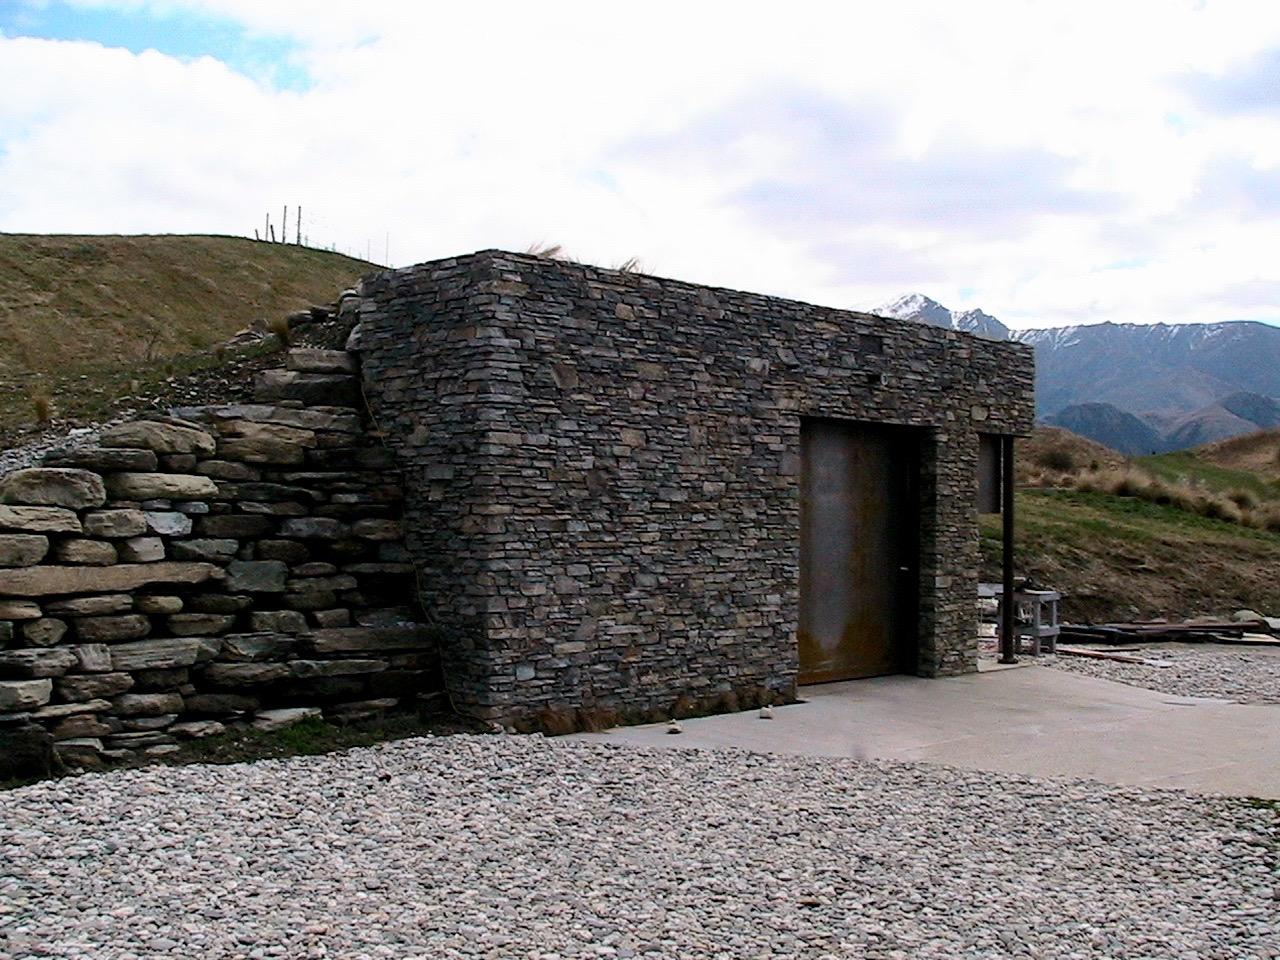 Lamont cellar